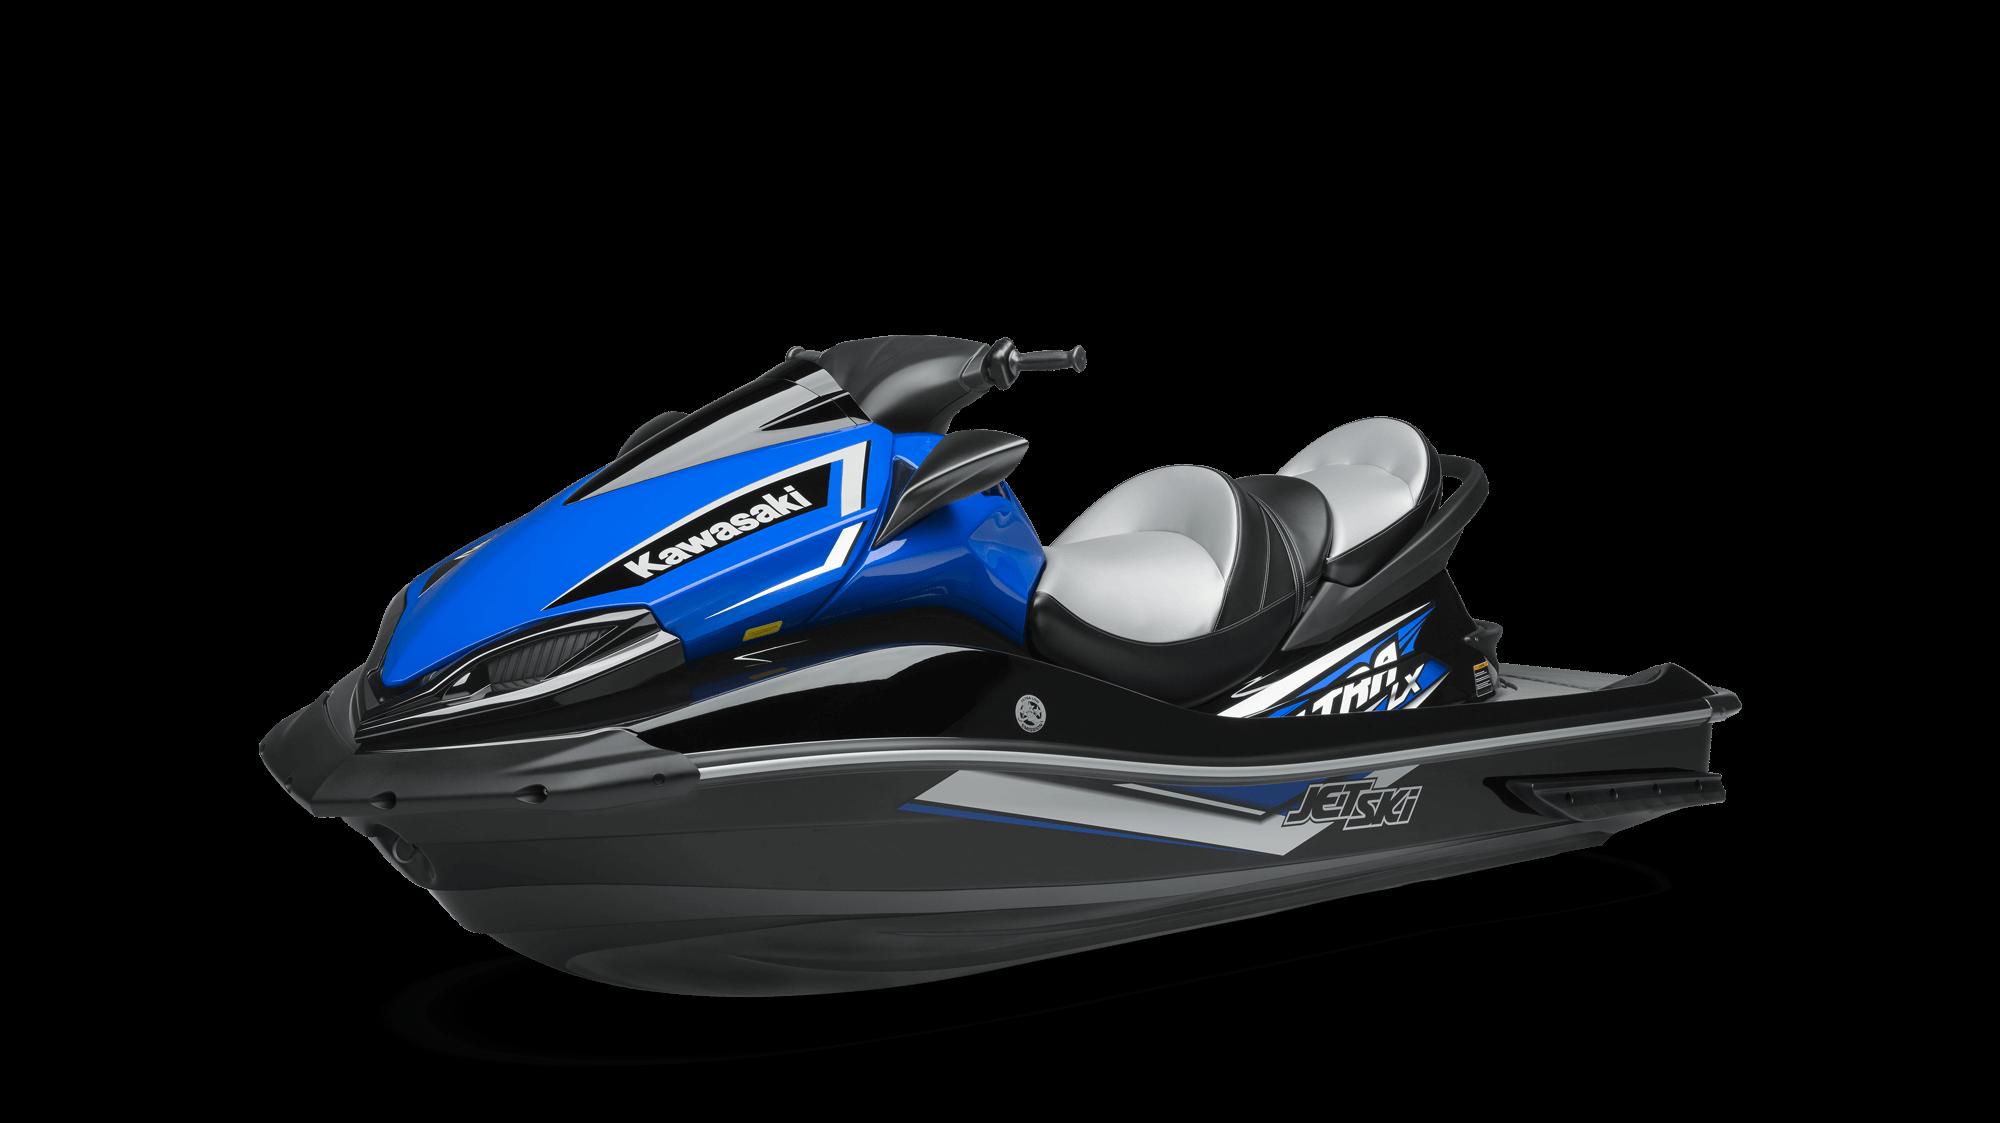 Kawasaki Jet Ski Value